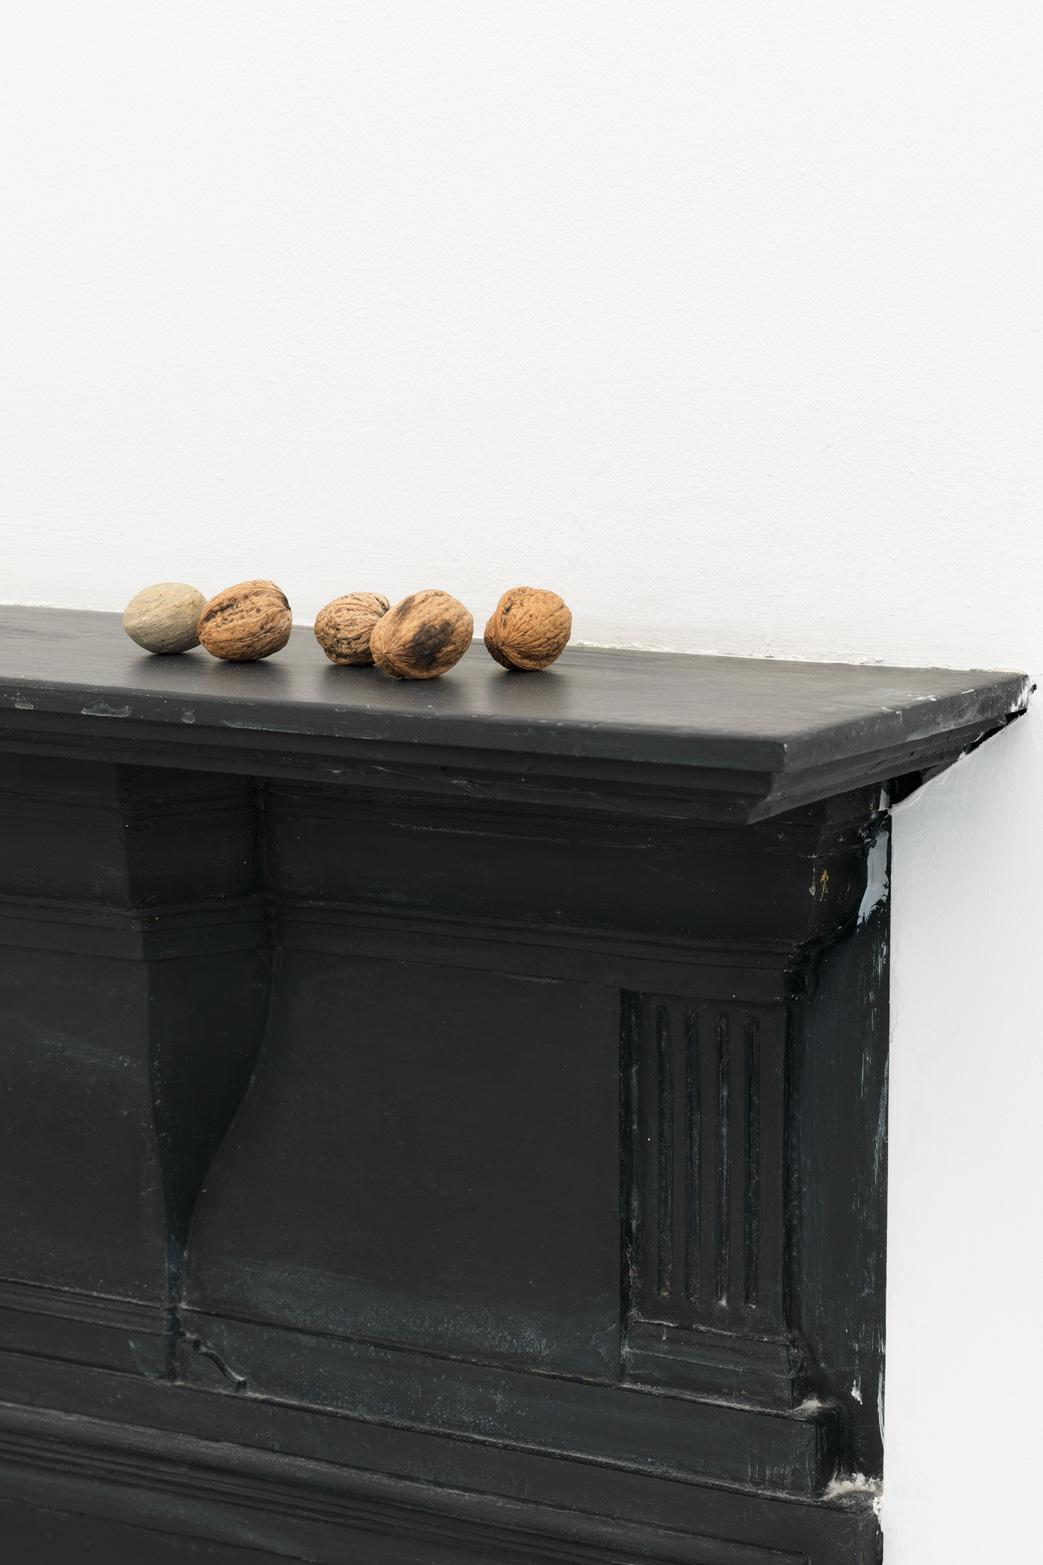 Petra Feriancová,  Survivals, Relics, Souvenirs.  Nuts, 2013. Tenderpixel Gallery.